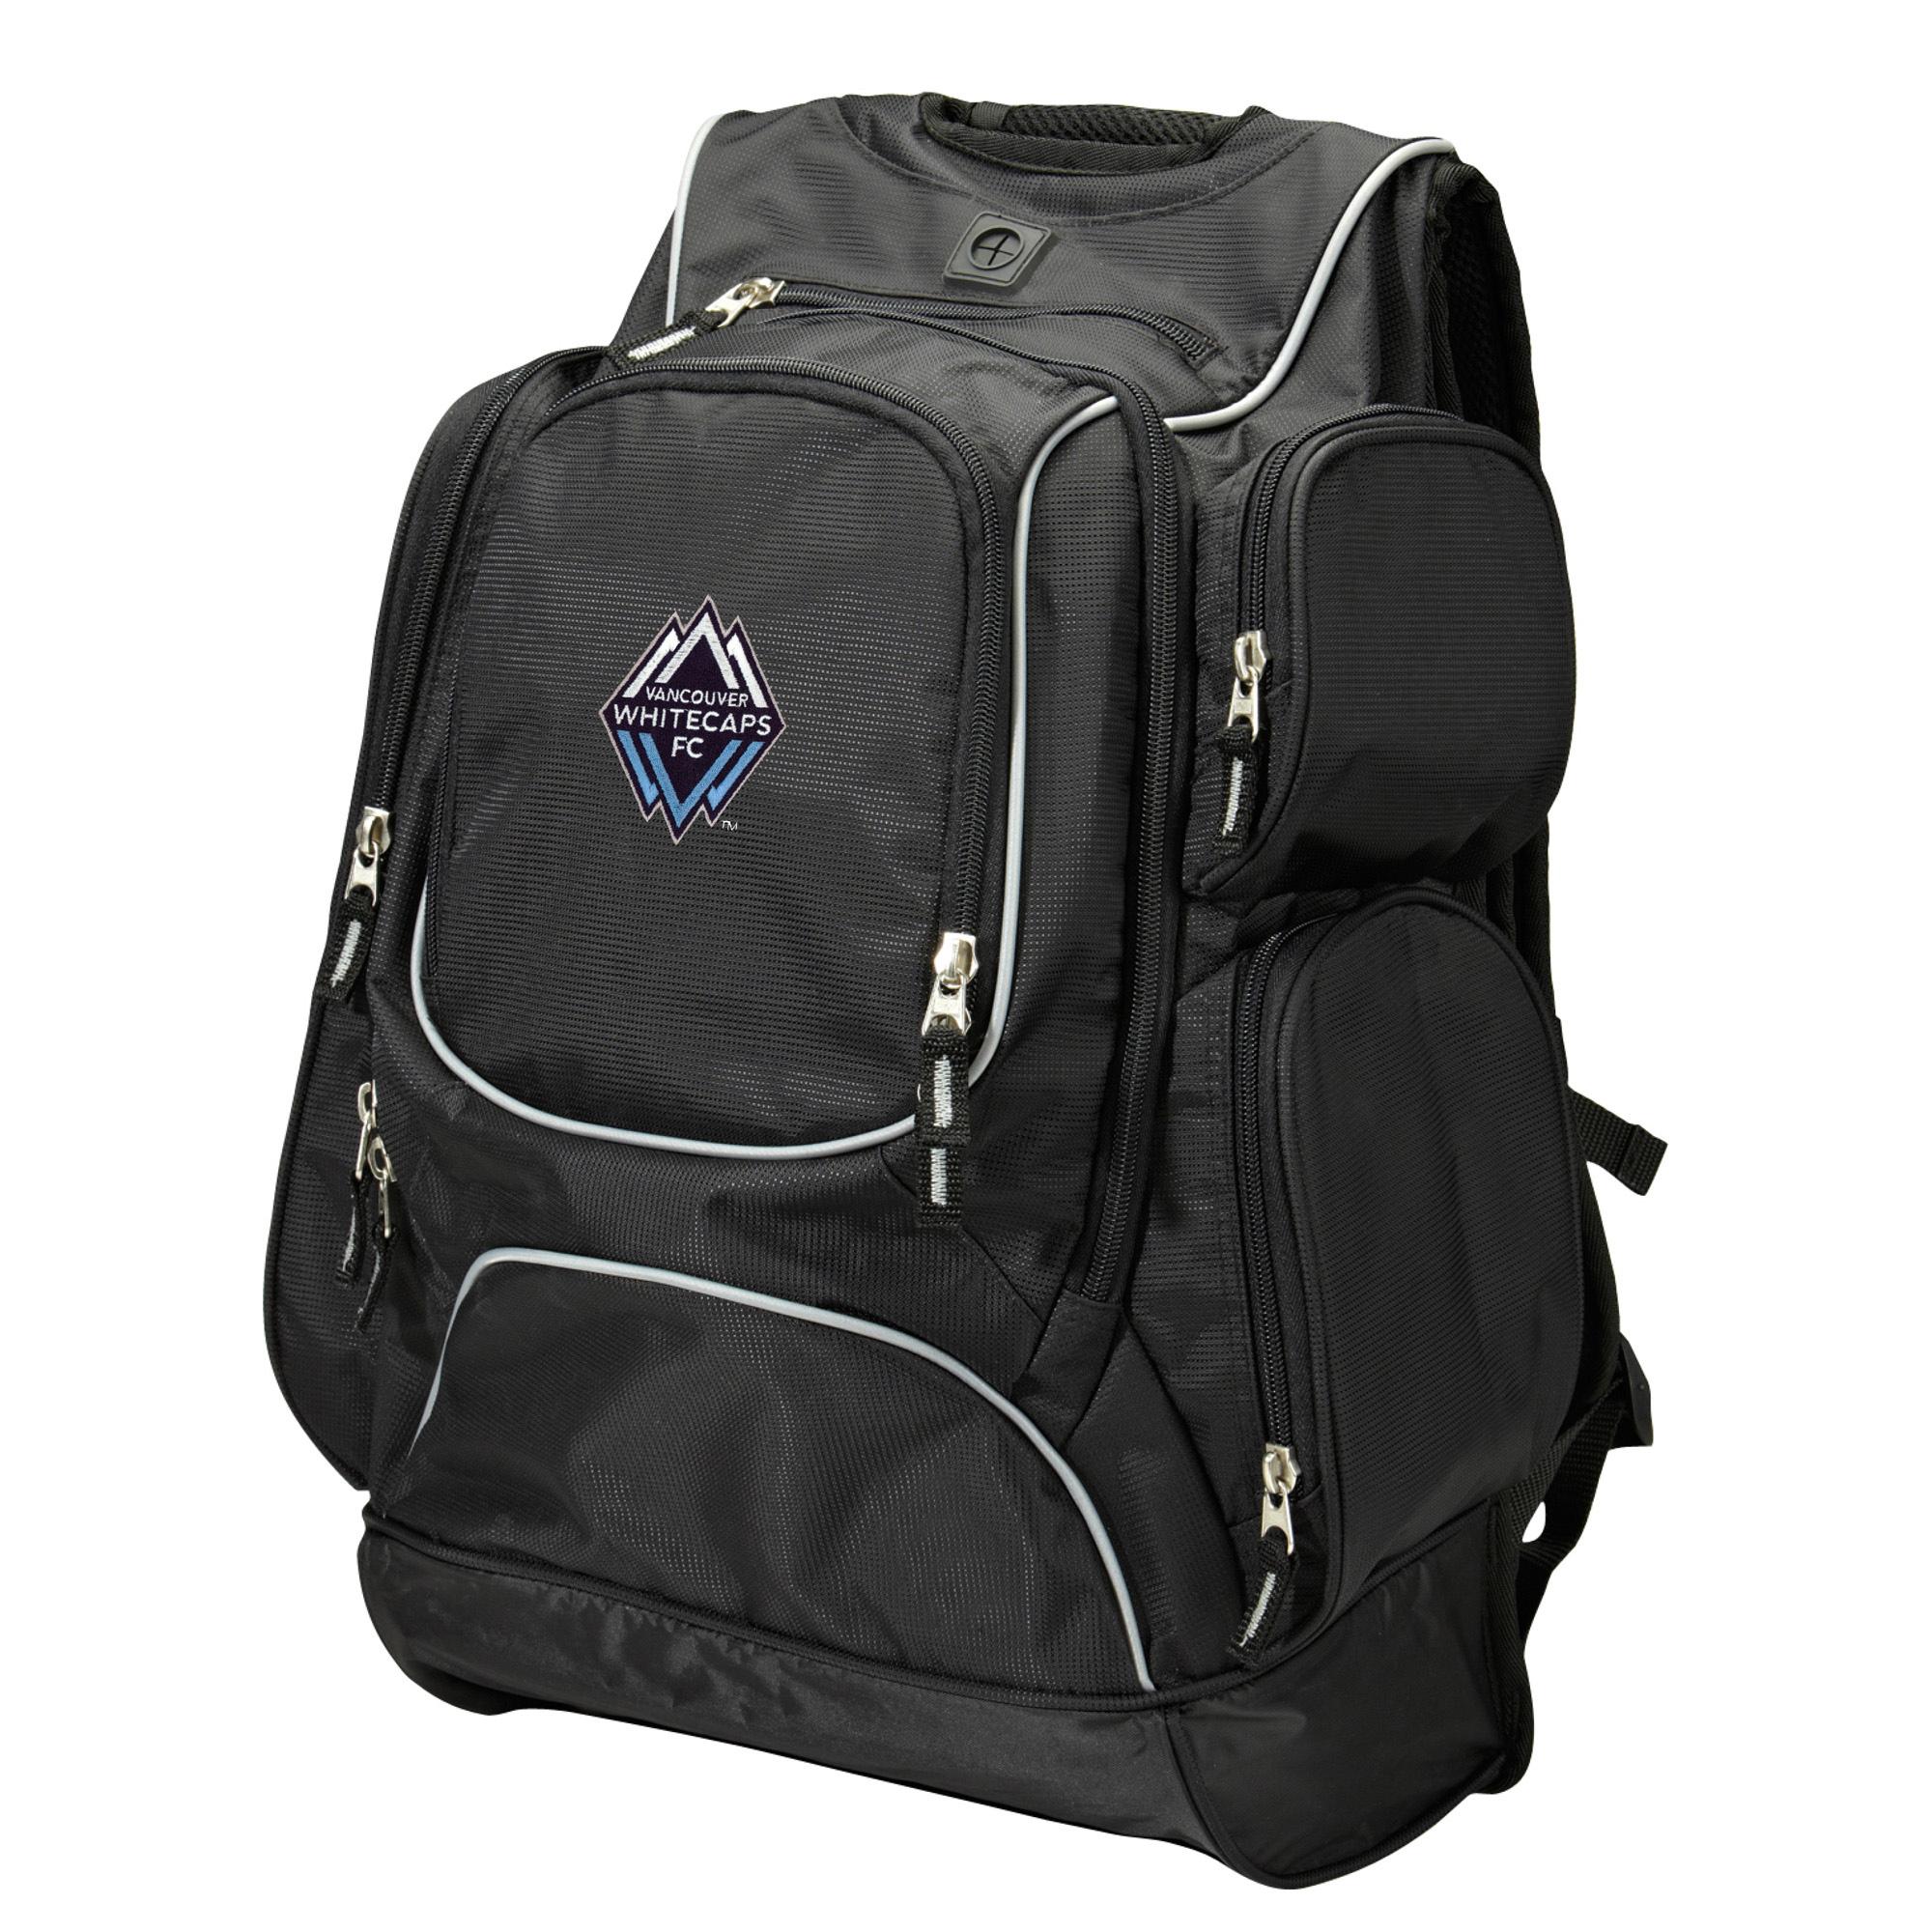 Vancouver Whitecaps FC Antigua Executive Backpack - Black/Gray - No Size